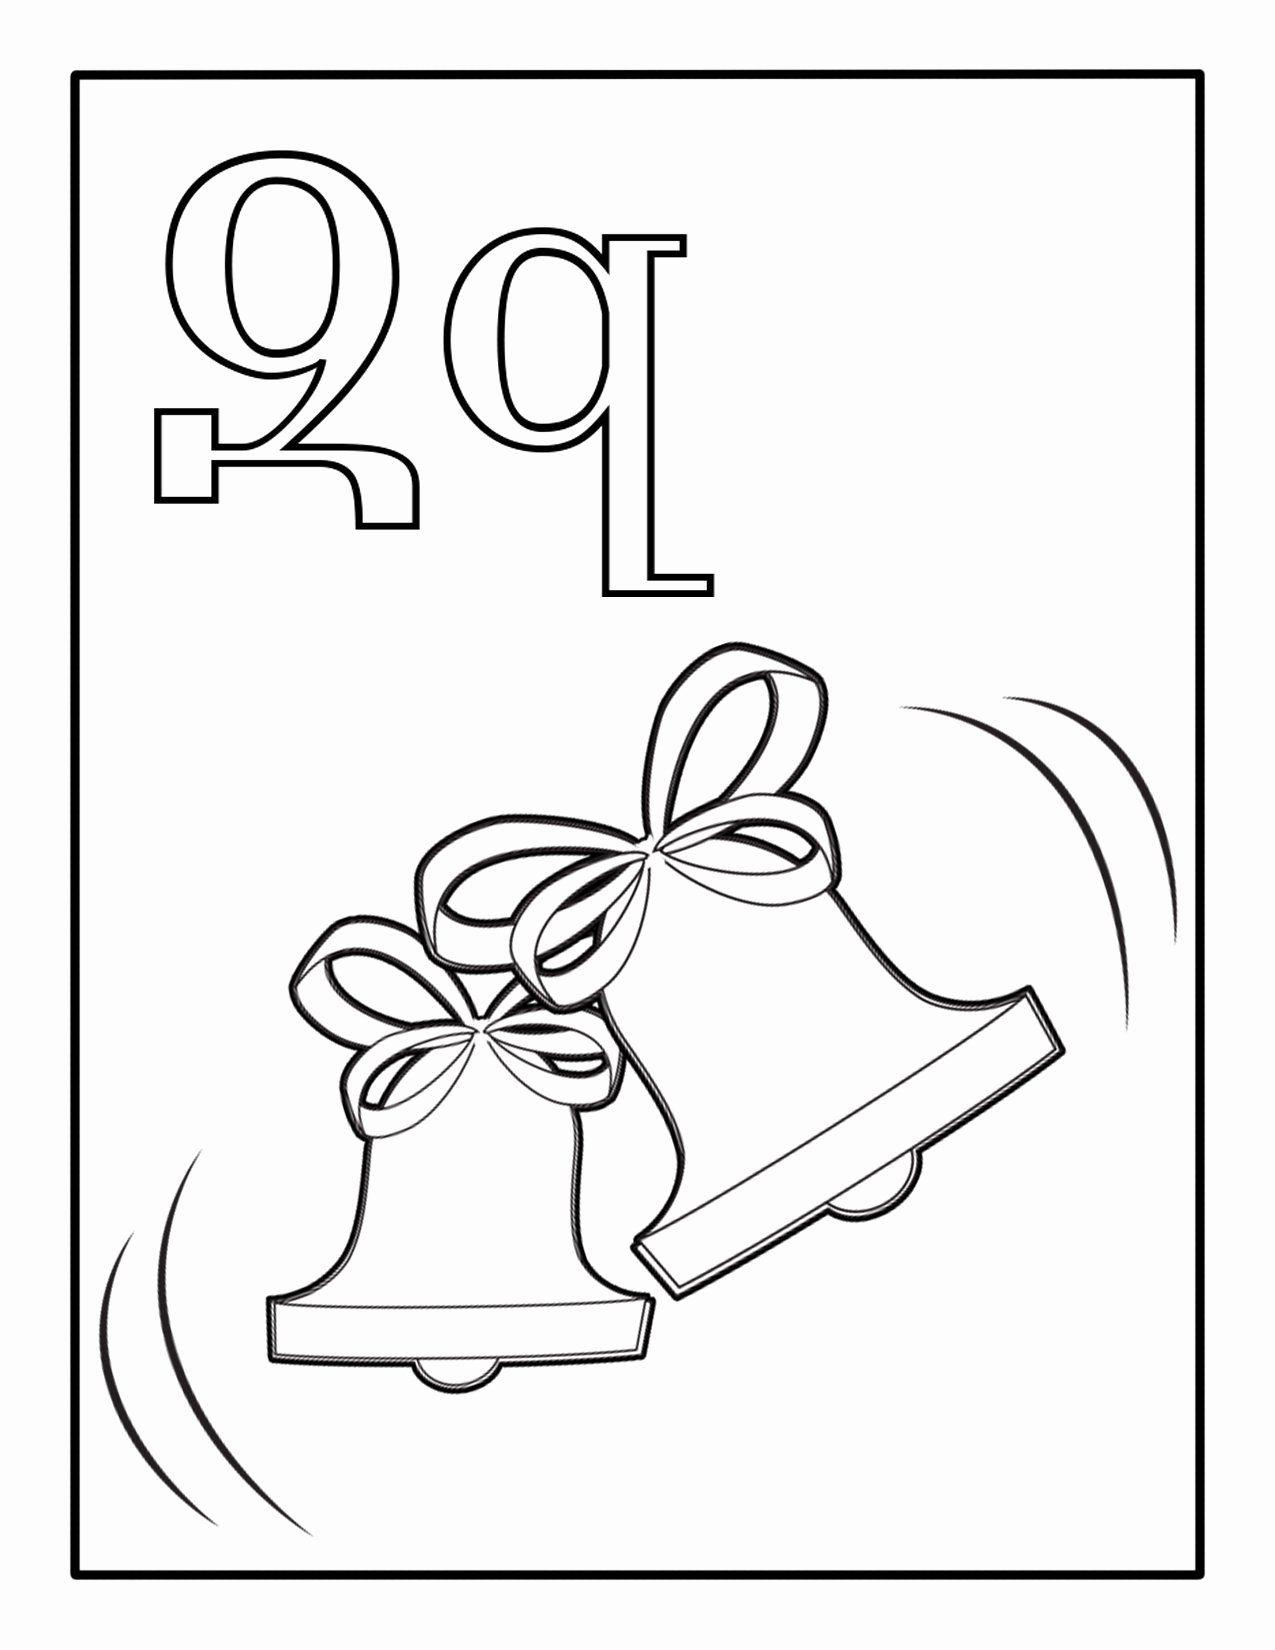 Alphabet Coloring Book Printables Elegant Alphabet Drawing Book At Paintingvalley Alphabet Coloring Pages Coloring Letters Alphabet Drawing